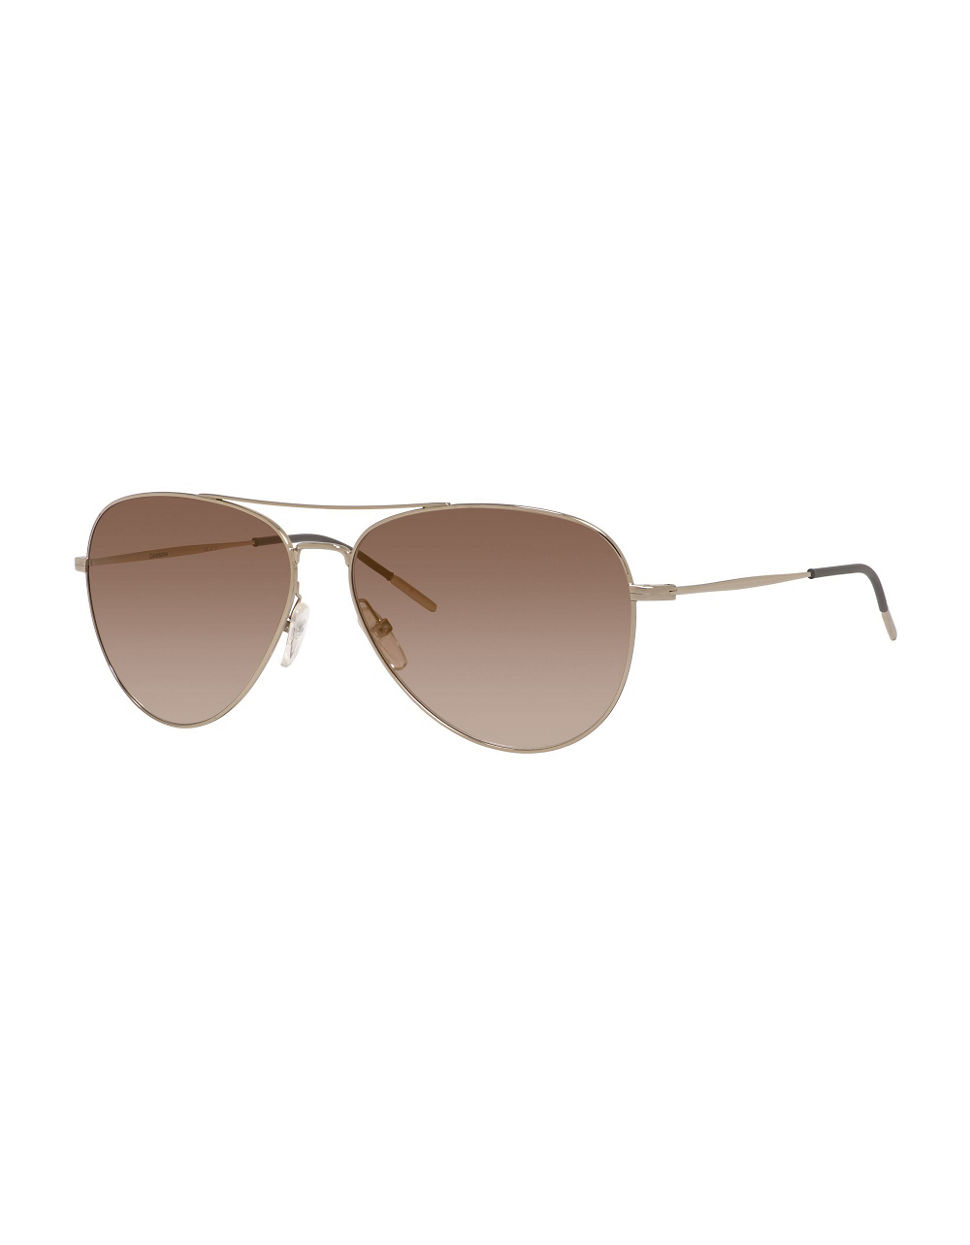 9ea06046a Carrera Metal Aviator Sunglasses | United Nations System Chief ...